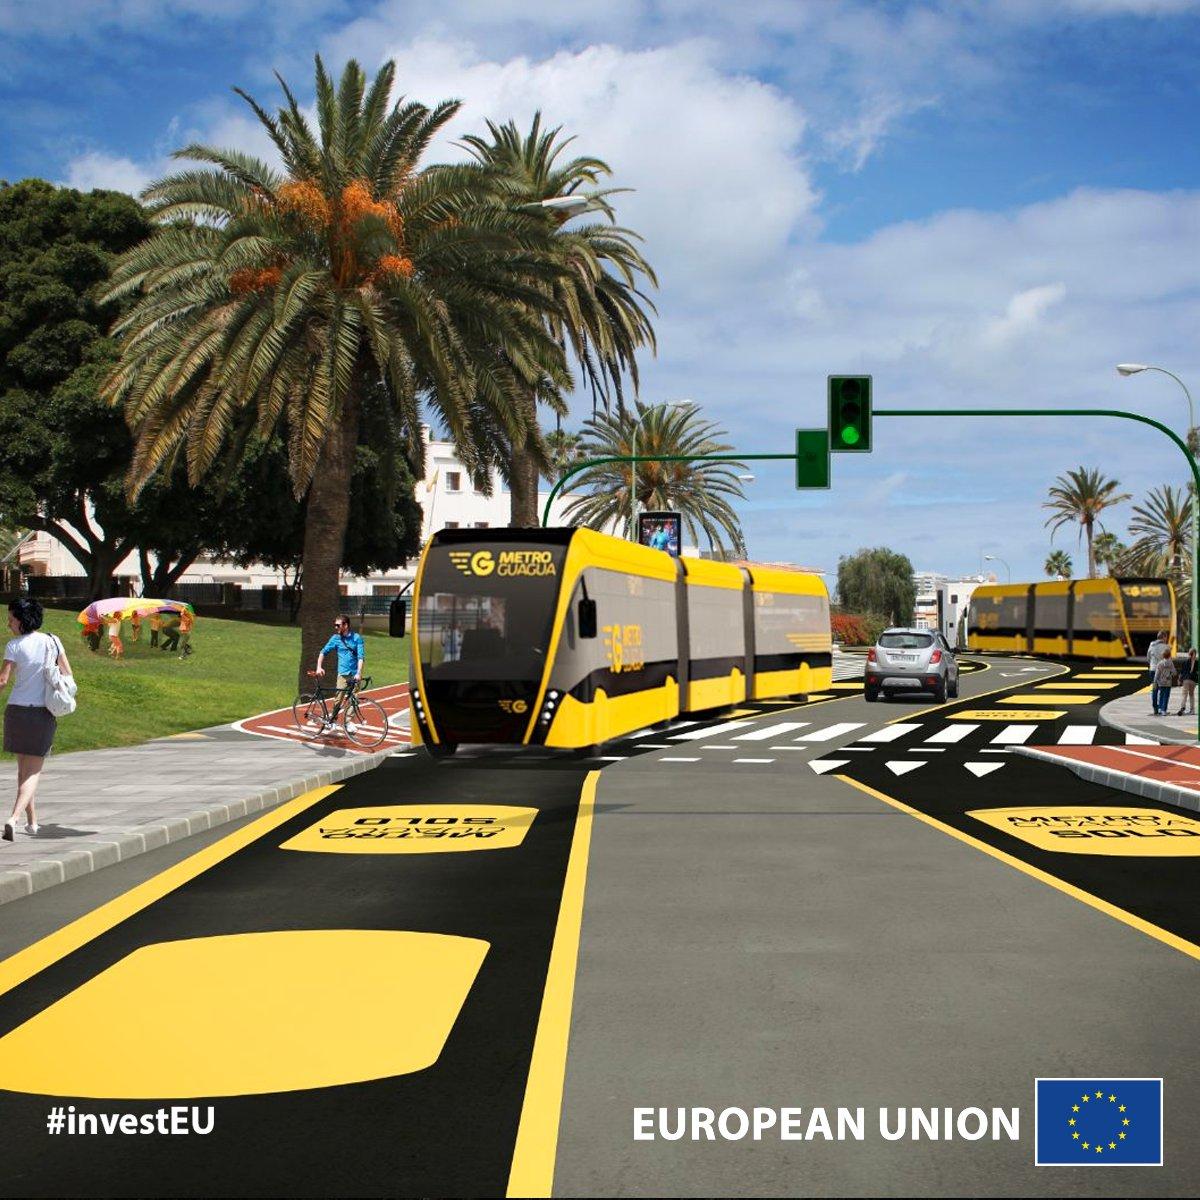 test Twitter Media - #Innovative bus line for Las Palmas de #GranCanaria https://t.co/wudZflPlxk https://t.co/dkvR7sobjH